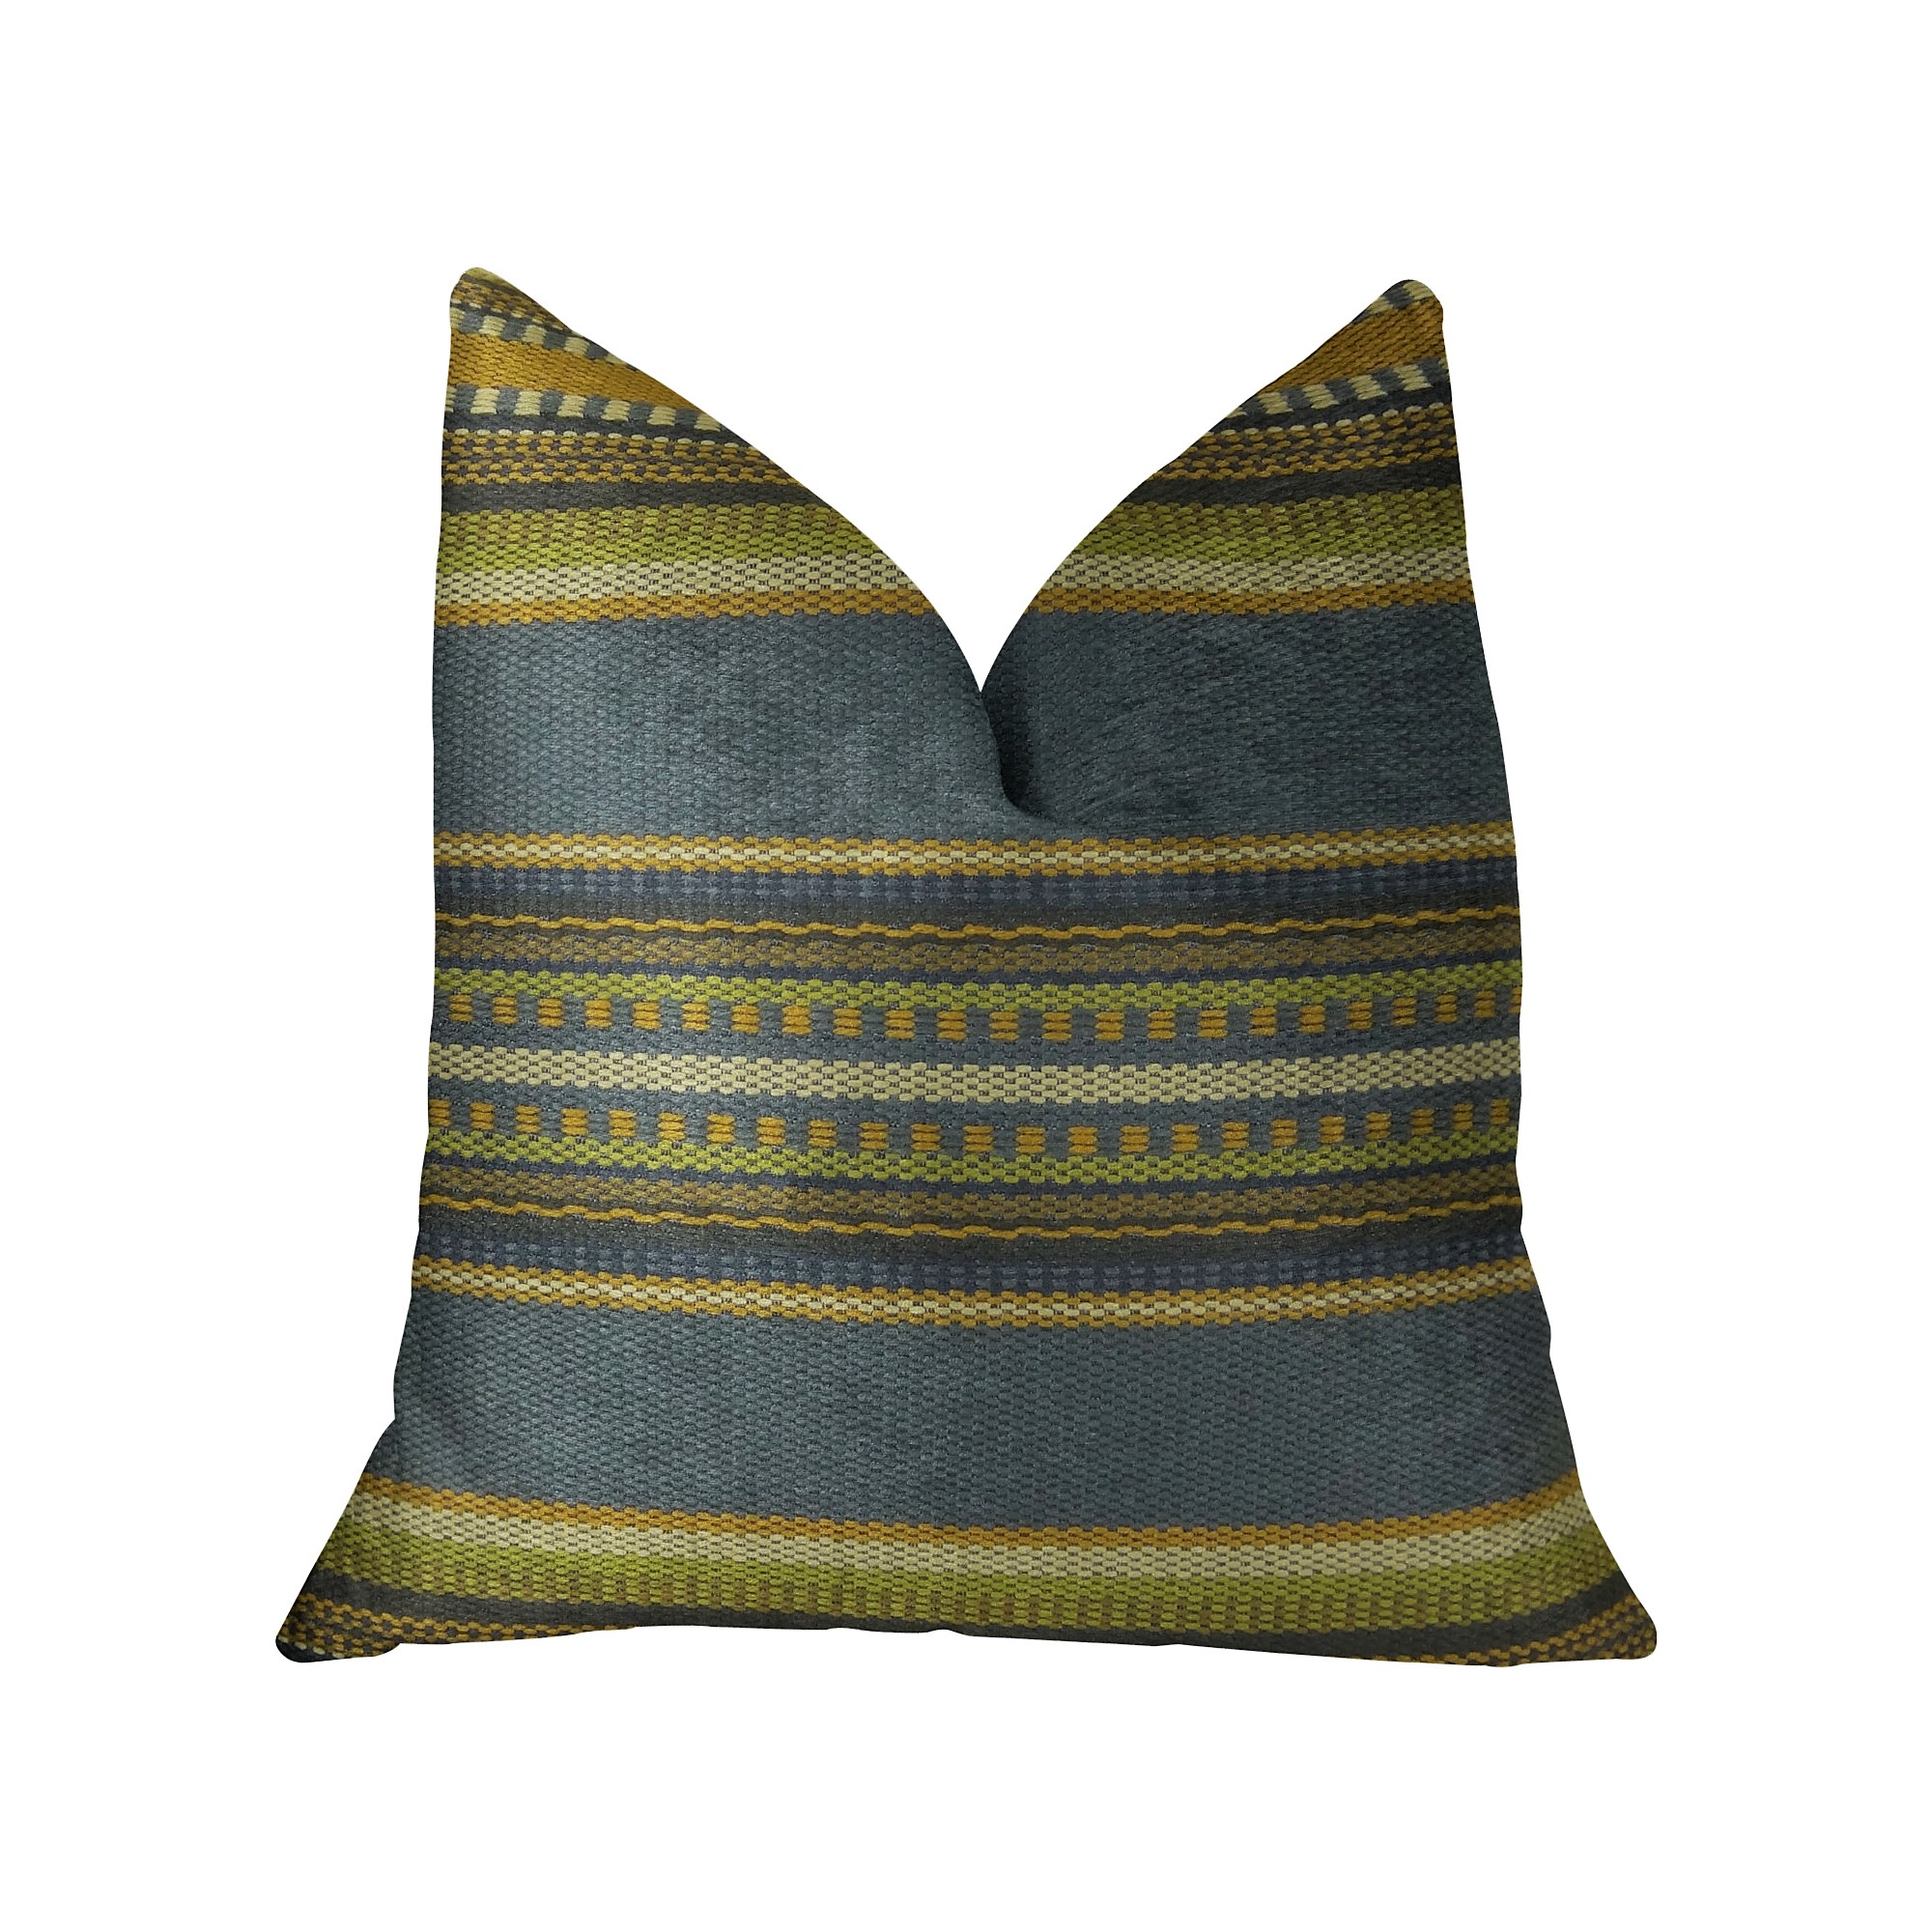 Plutus Chic Stripe Indigo Handmade Pillow, Double Sided